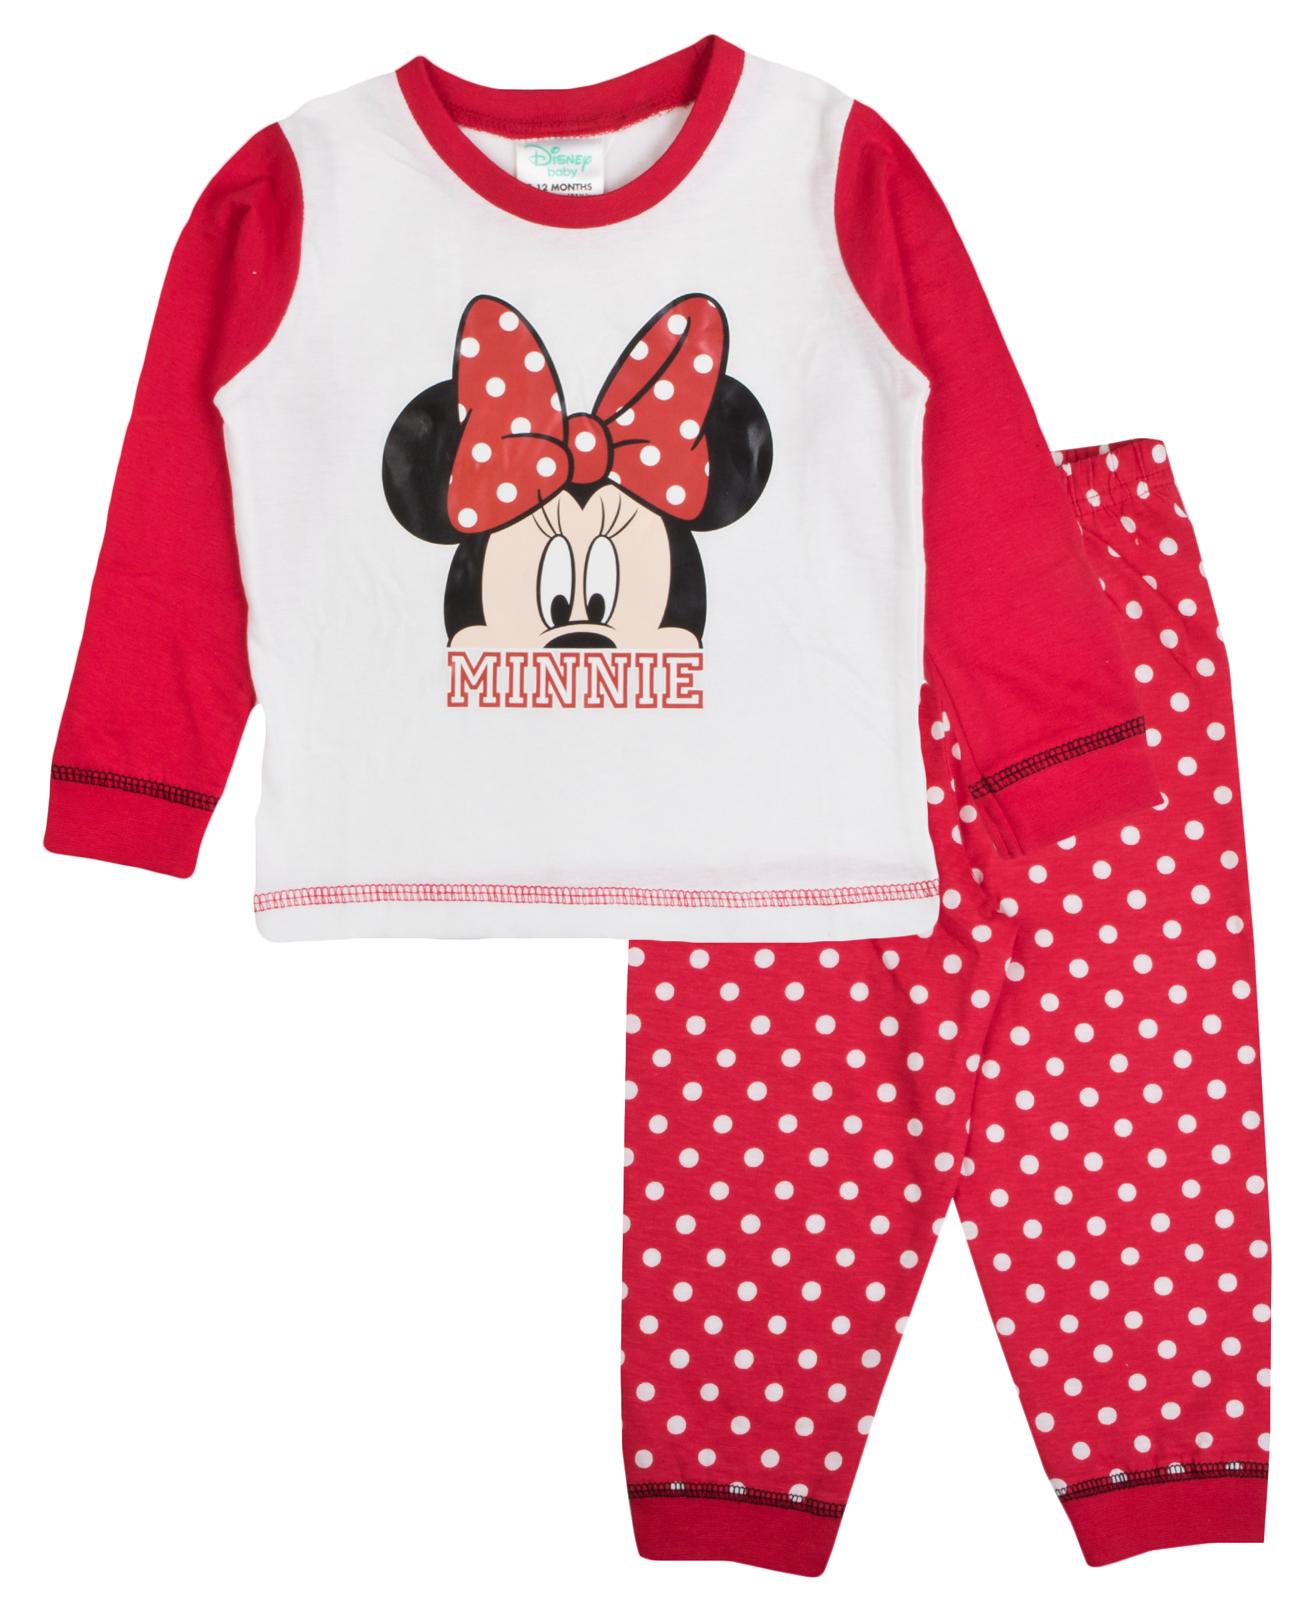 Baby Girls Pyjamas Kids Toddlers Disney Minnie Mouse Pjs Set Me To ... efadb9630